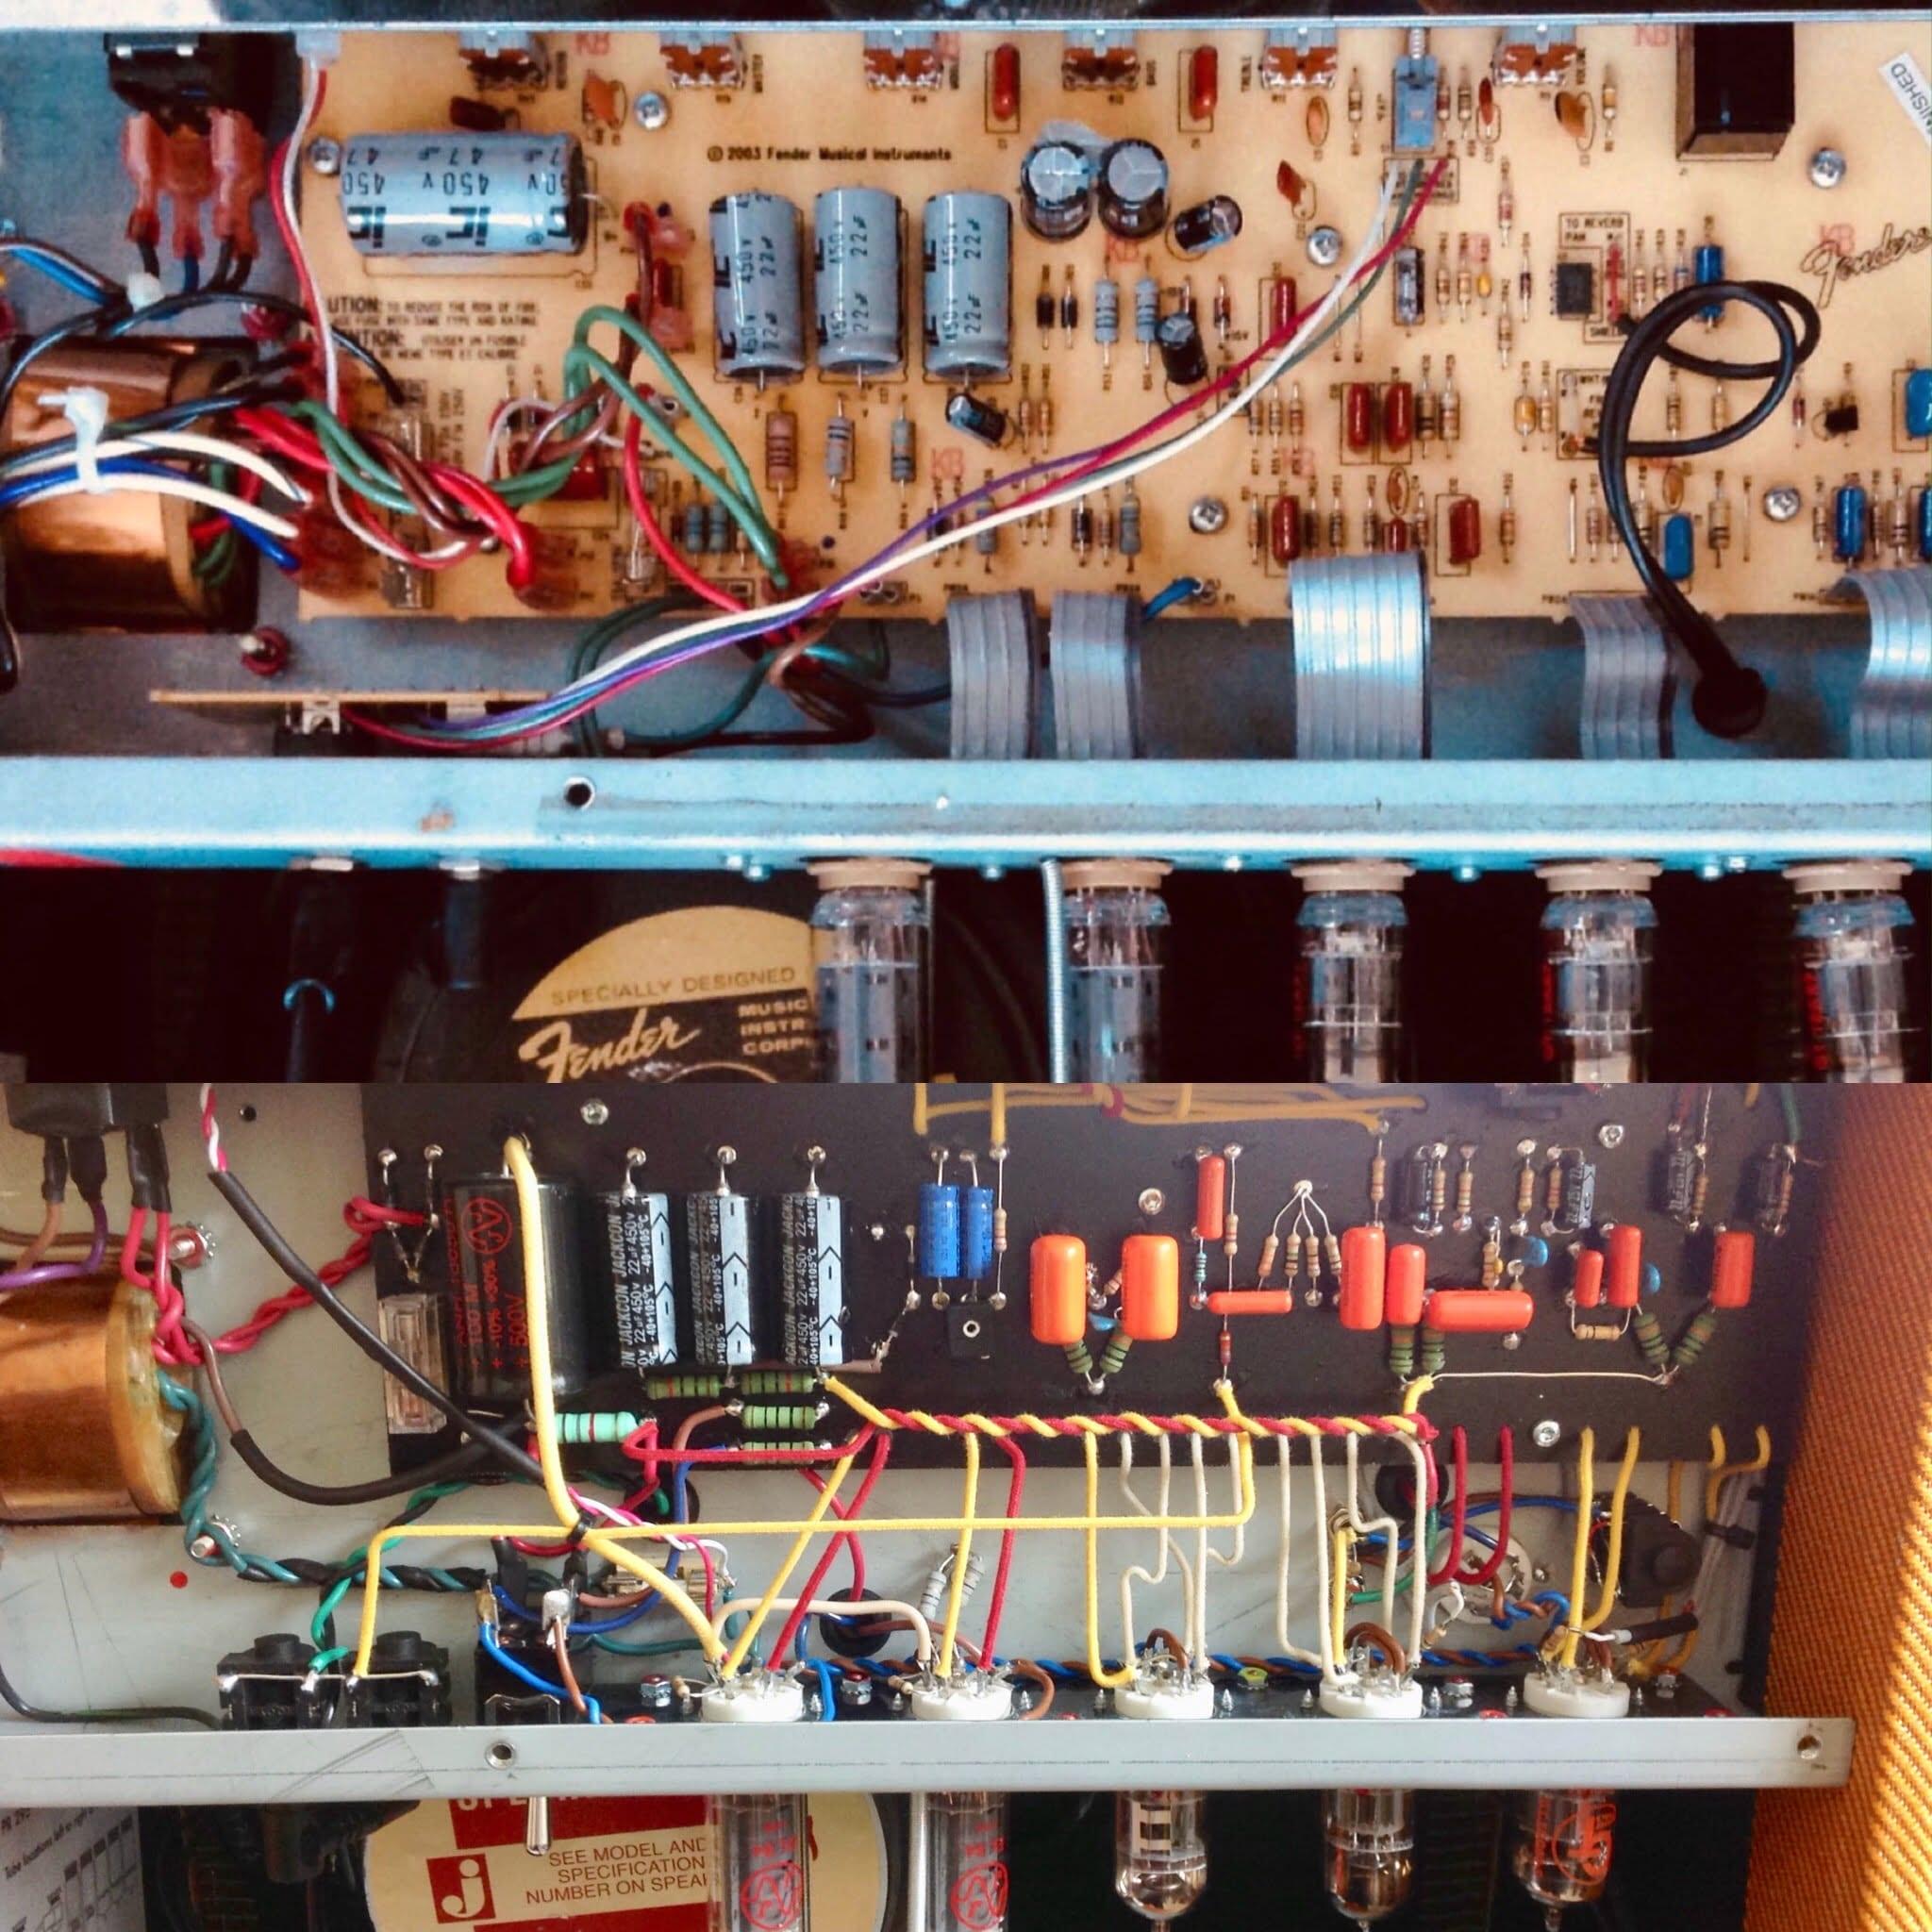 fender Blues Jr standard vs Hardwired image